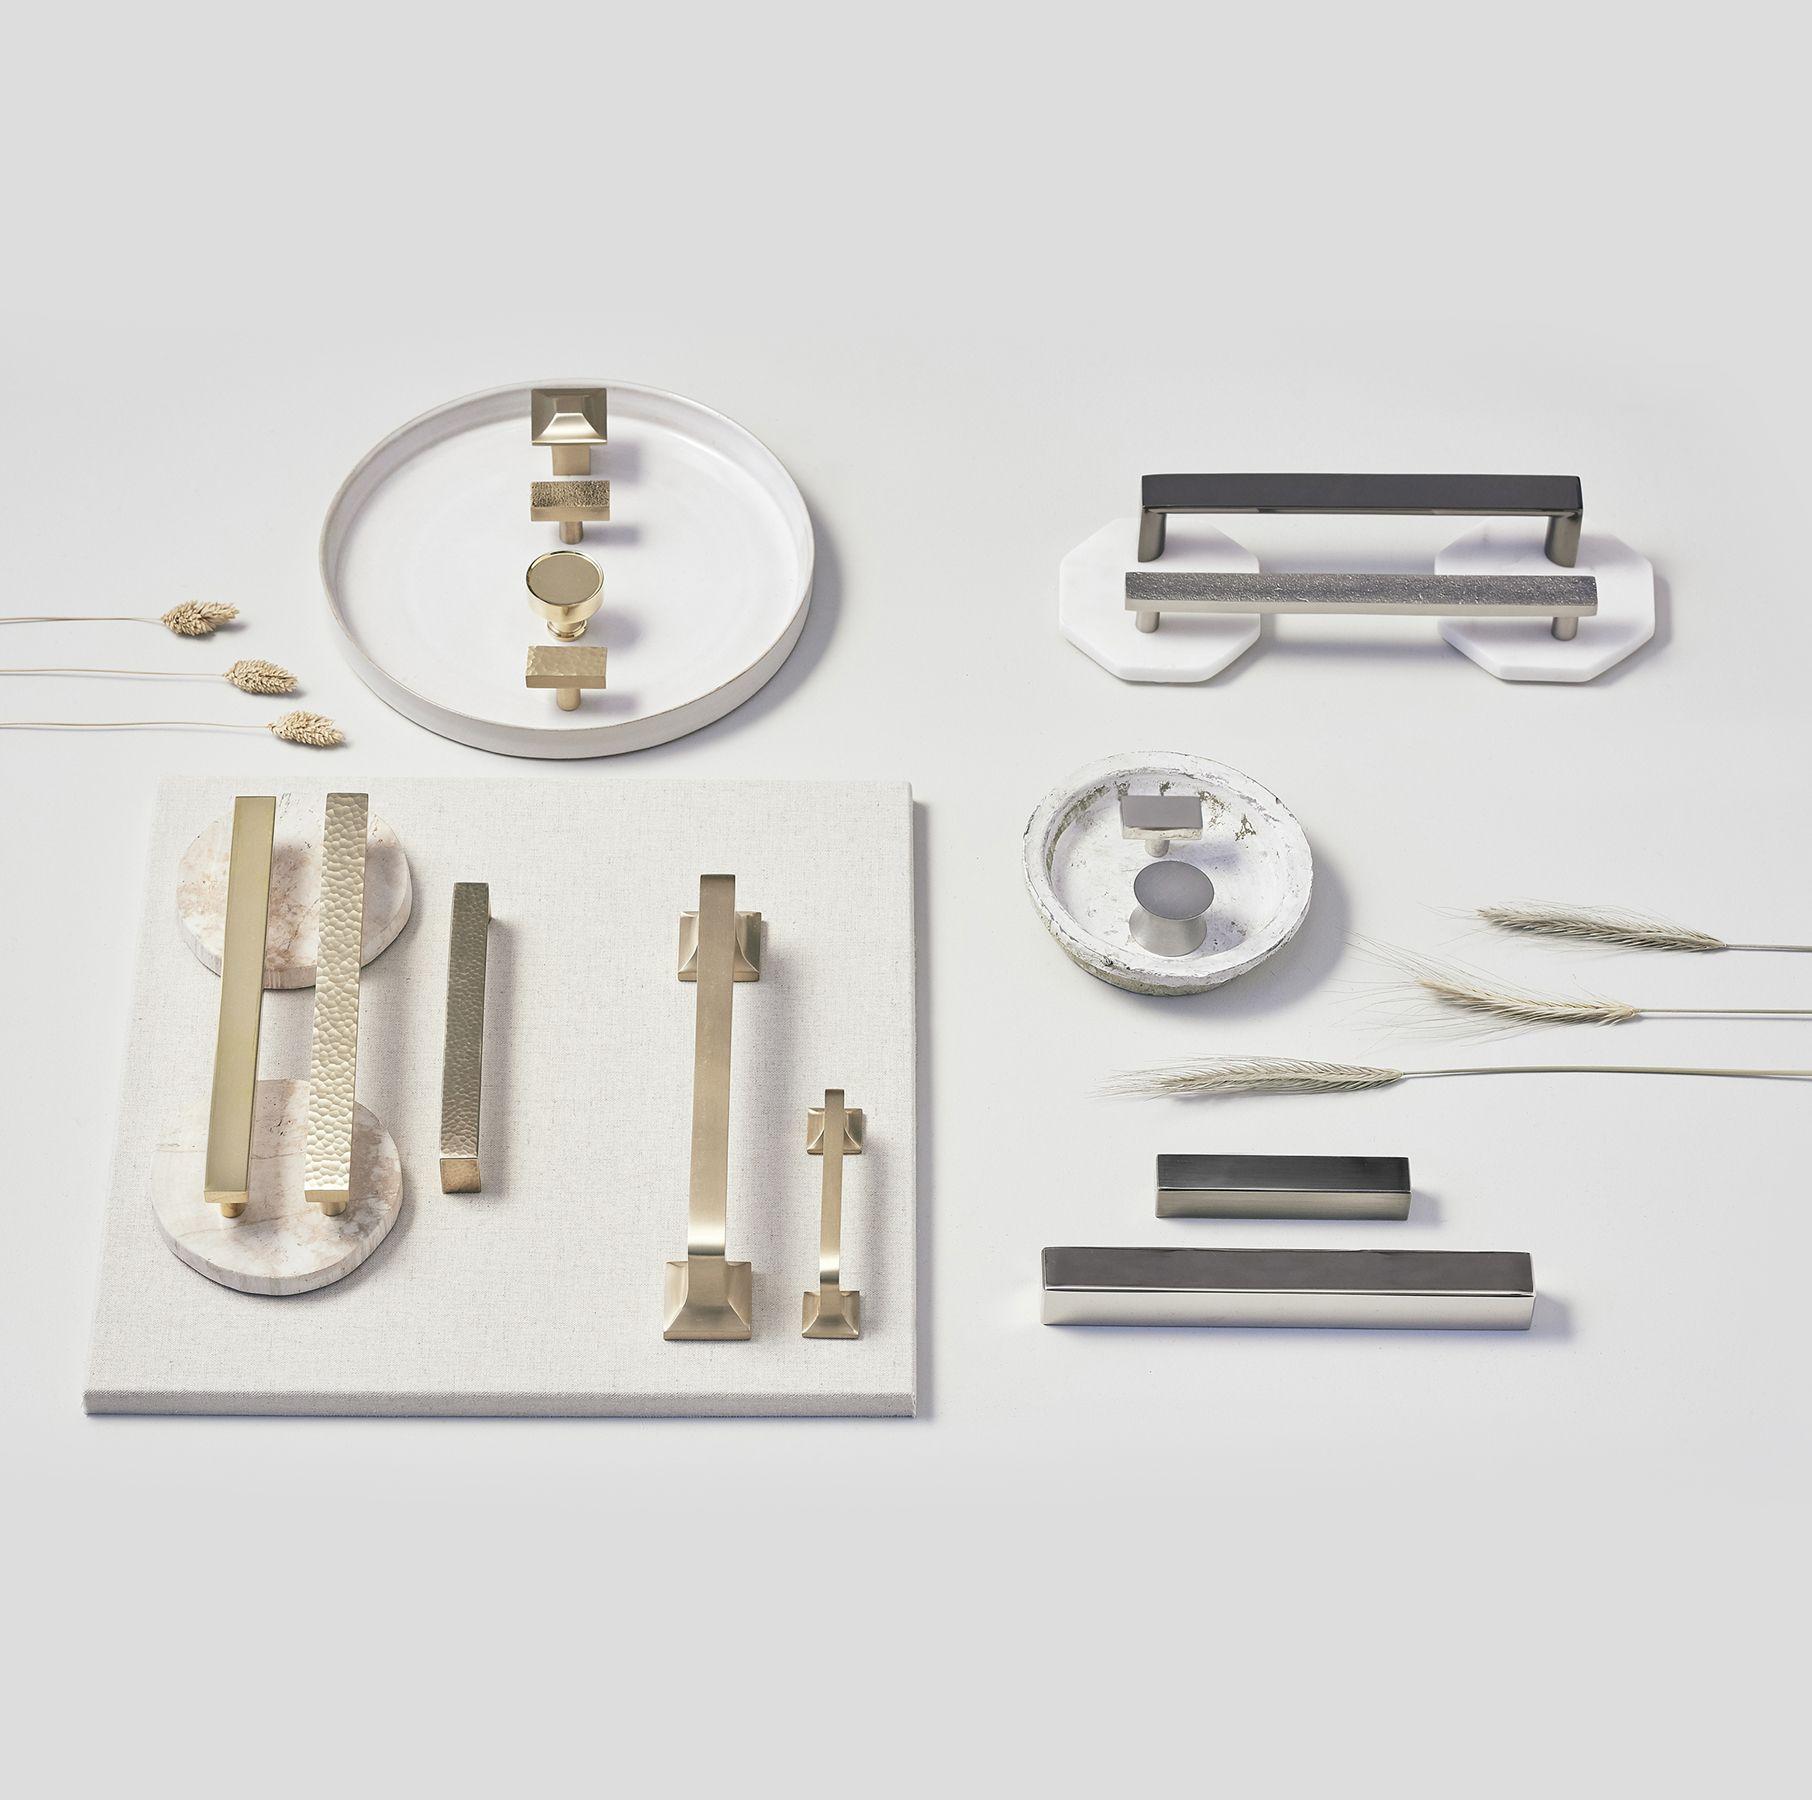 Update Your Kitchen Or Bath With Modern Brass Cabinet Hardware